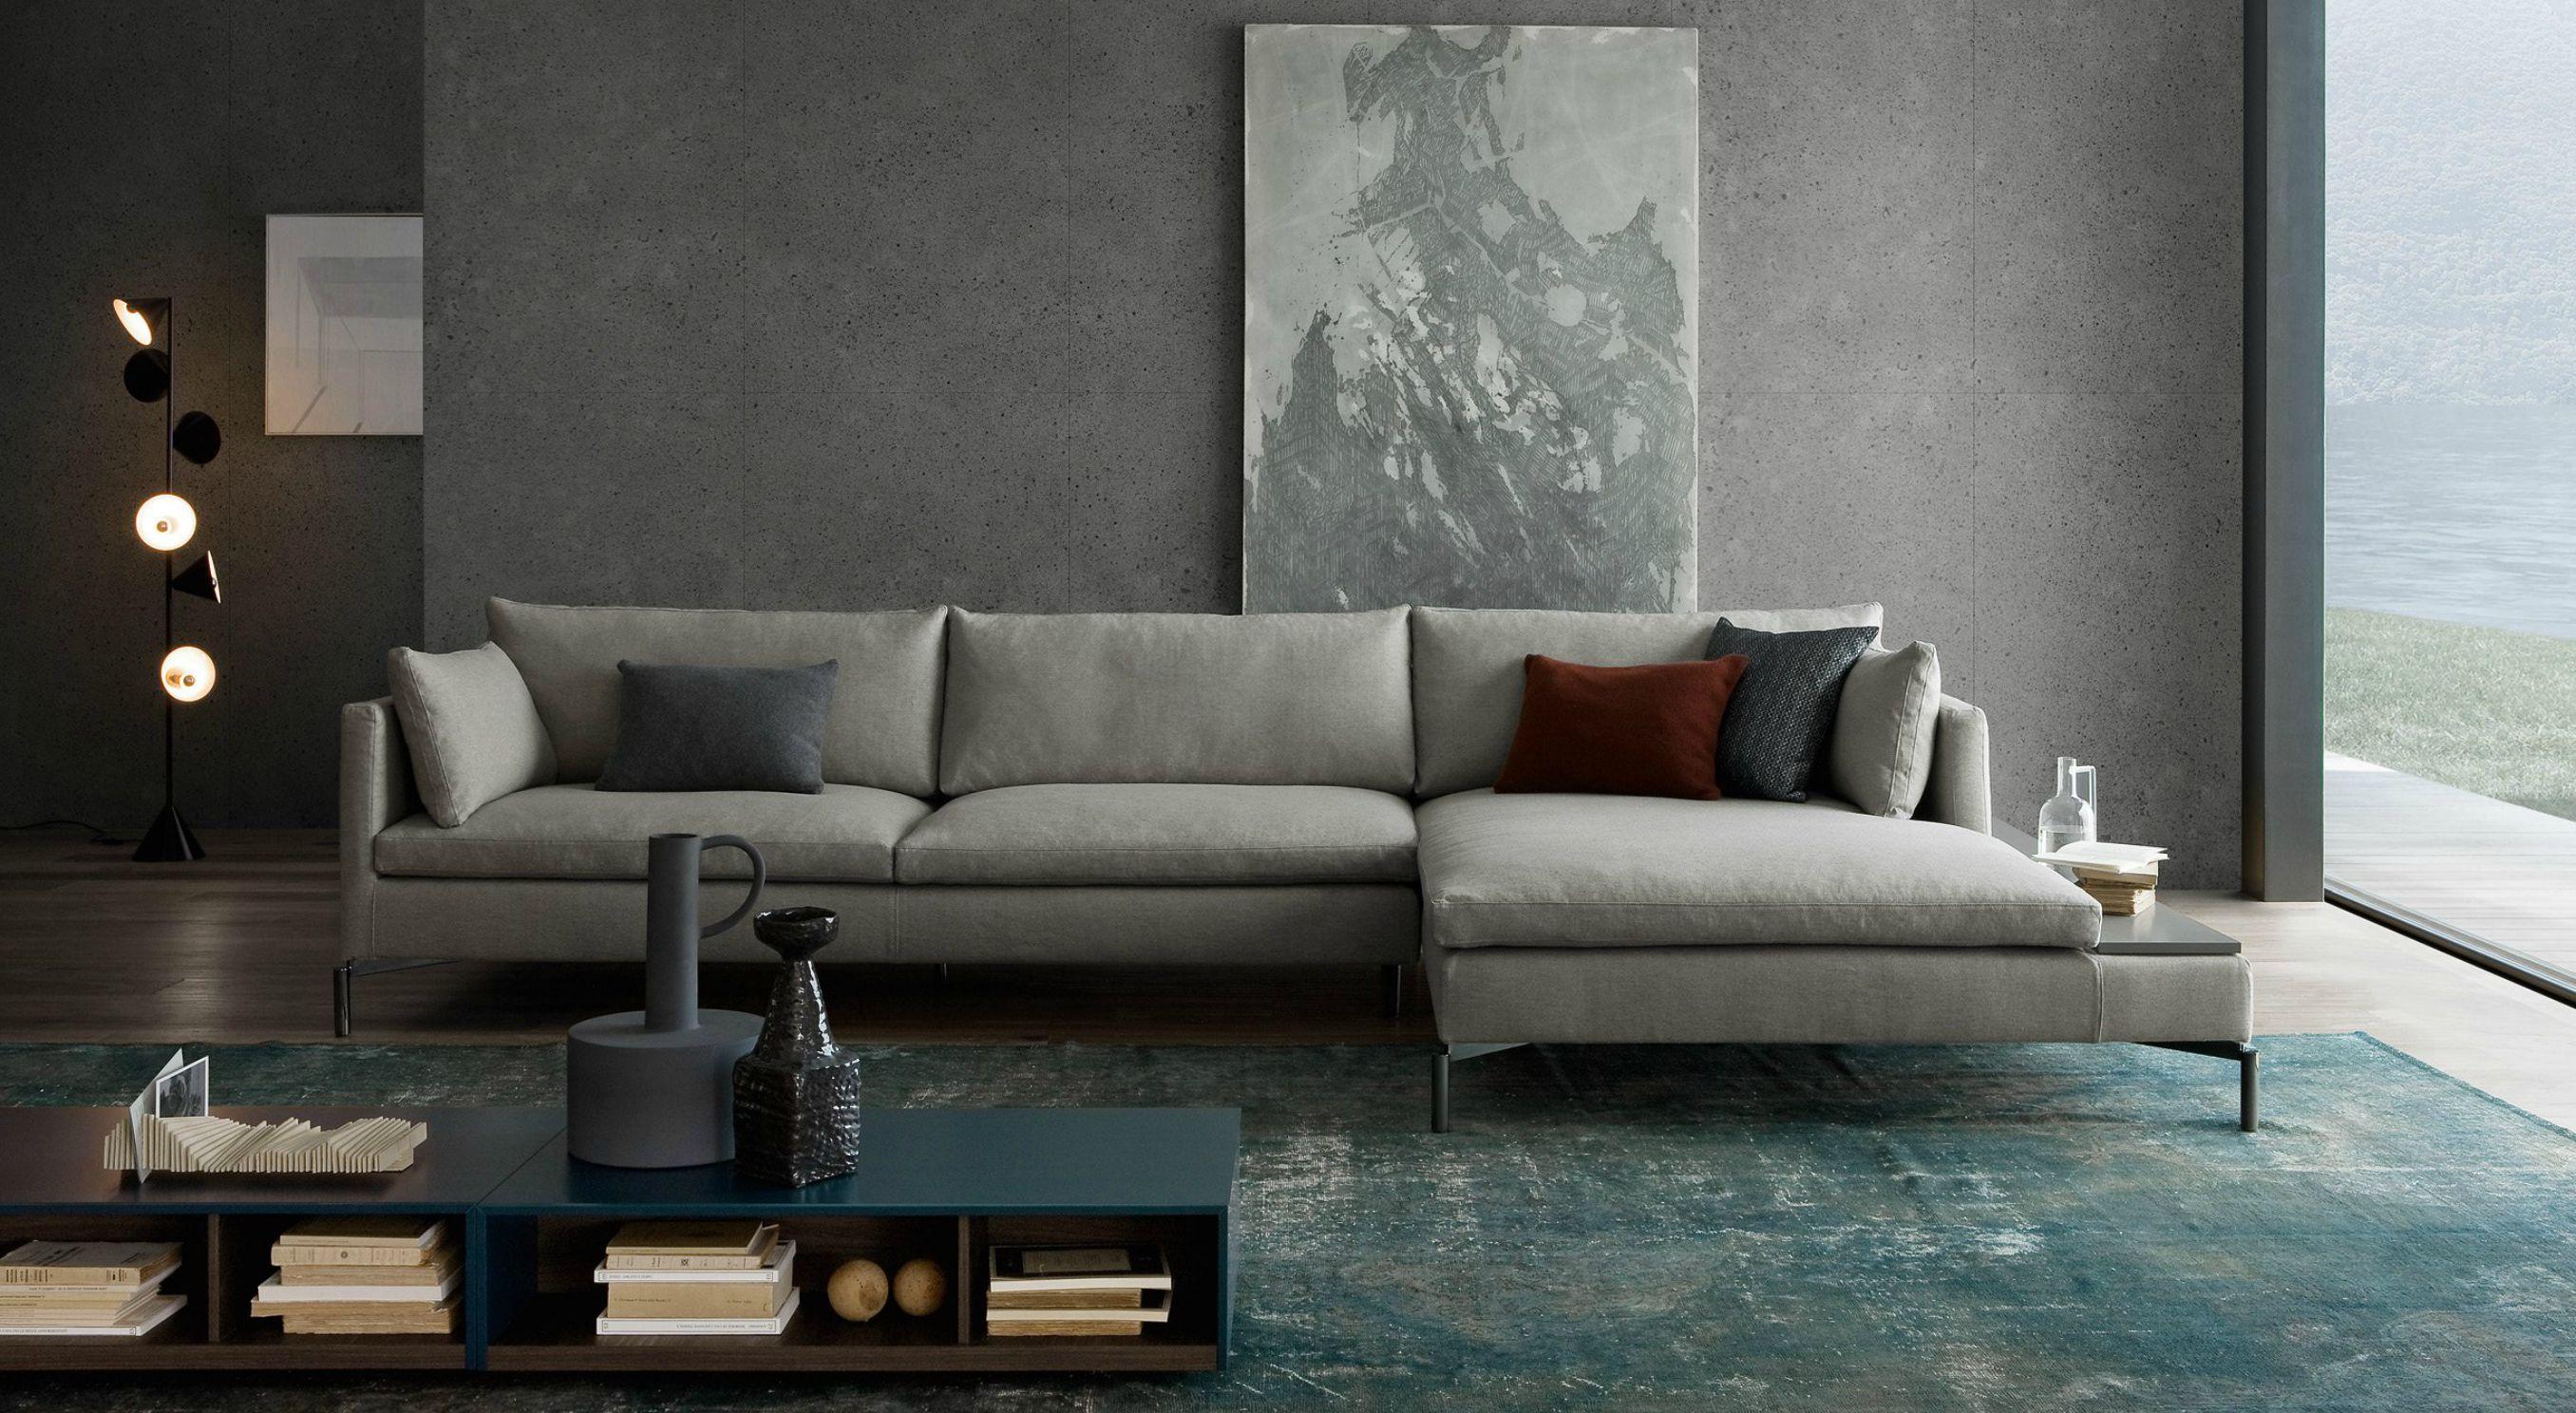 Reef kanap reef sofa gy rt manufacturer novamobili kanap k sofas - Novamobili living ...